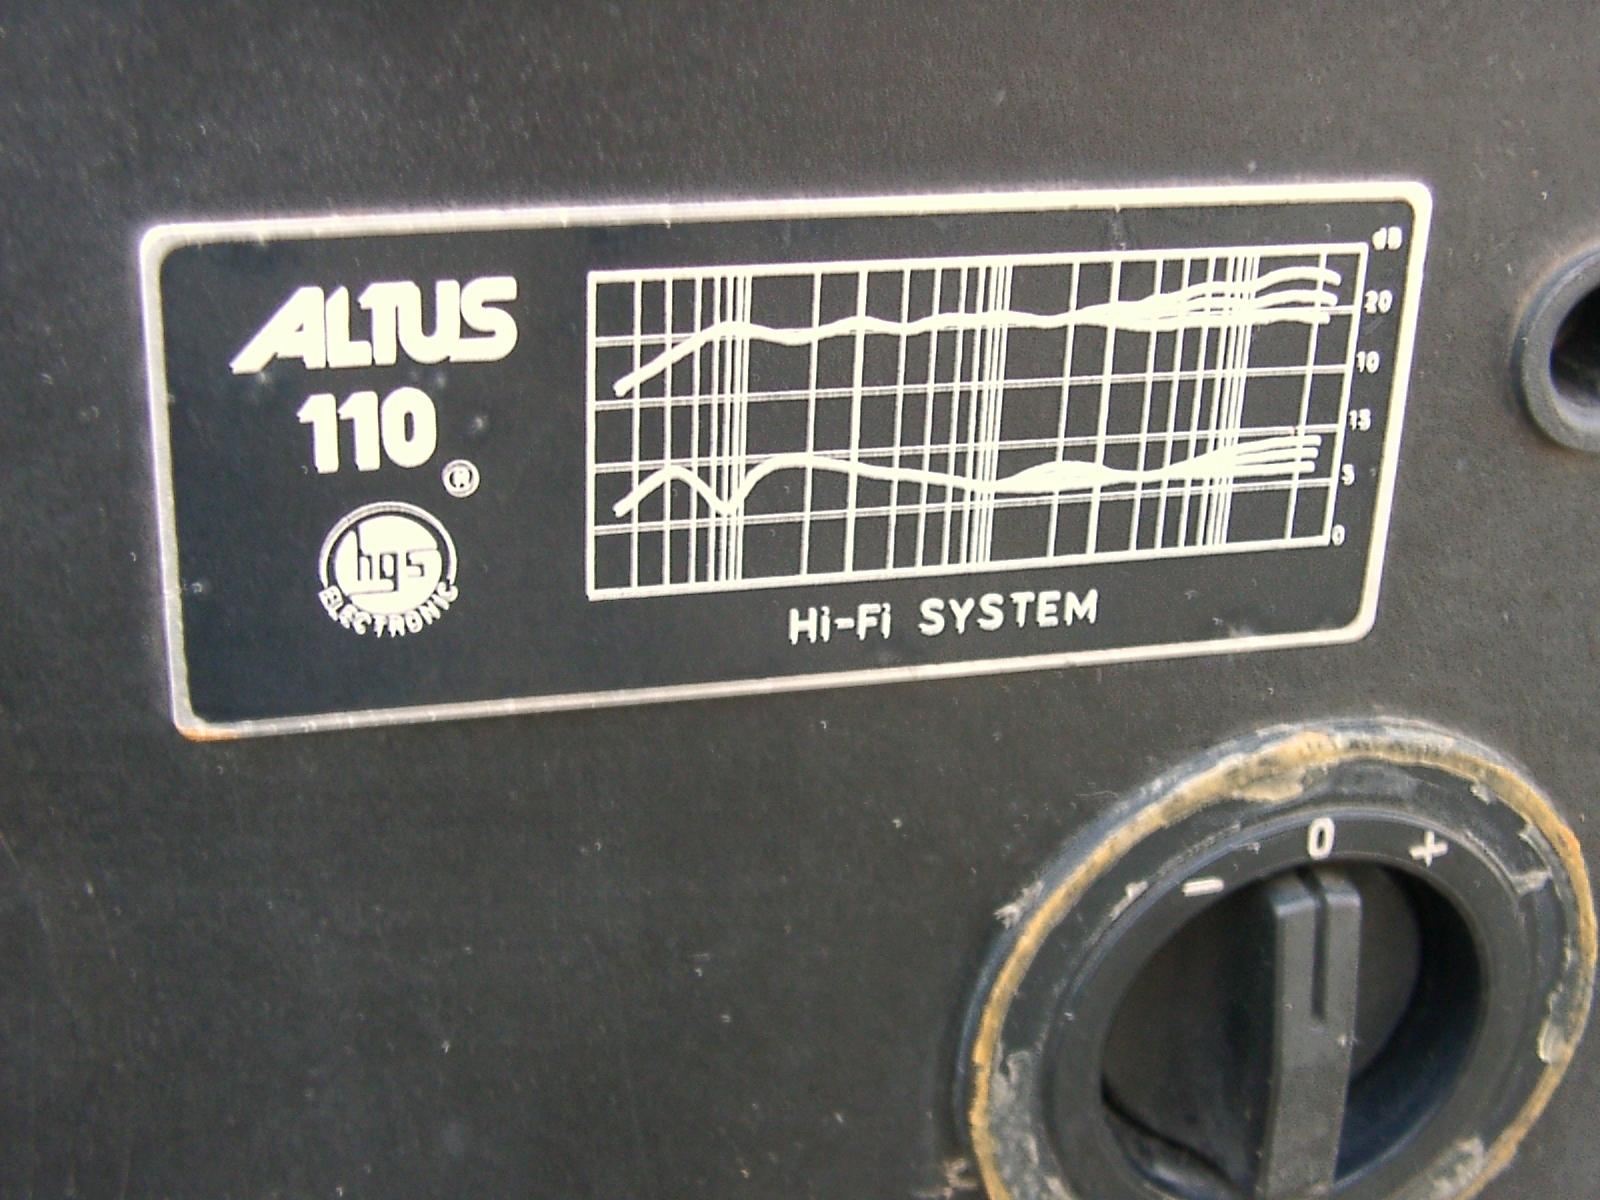 Kolumny ALTUS 110 (Unitra Tonsil) obudowy